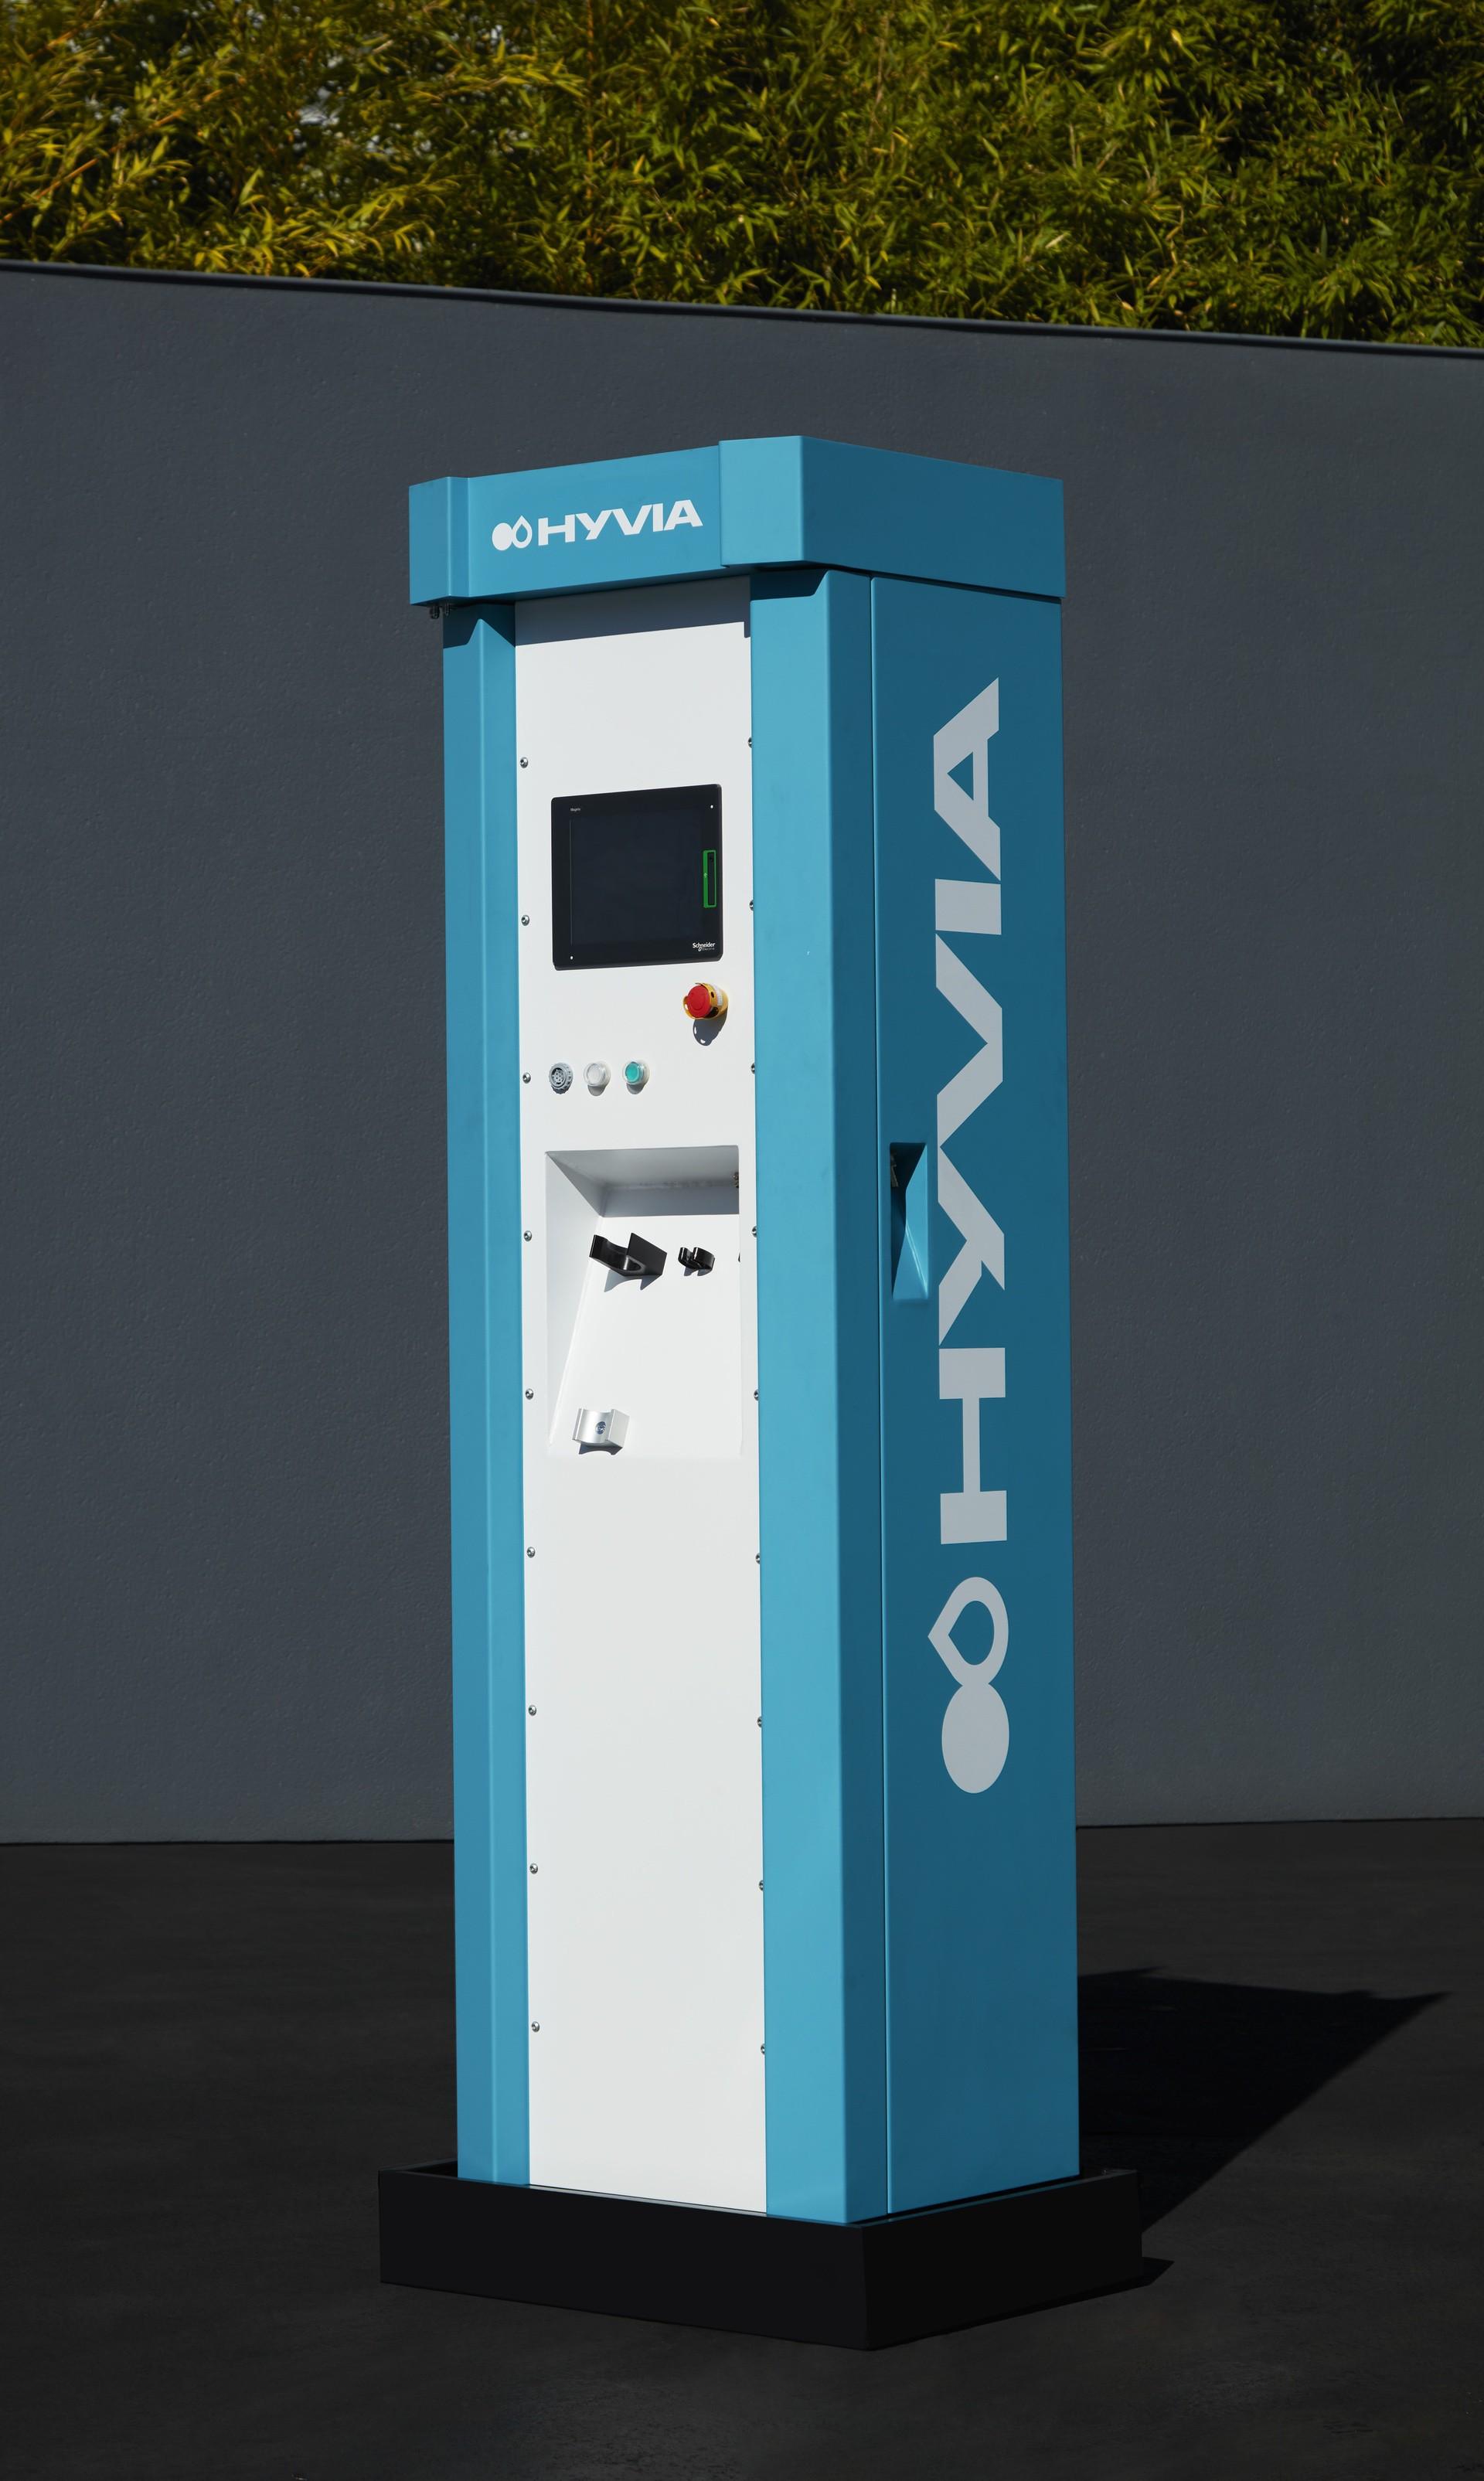 19-2021-HYVIA-Hydrogen-Refuelling-Station-prototype